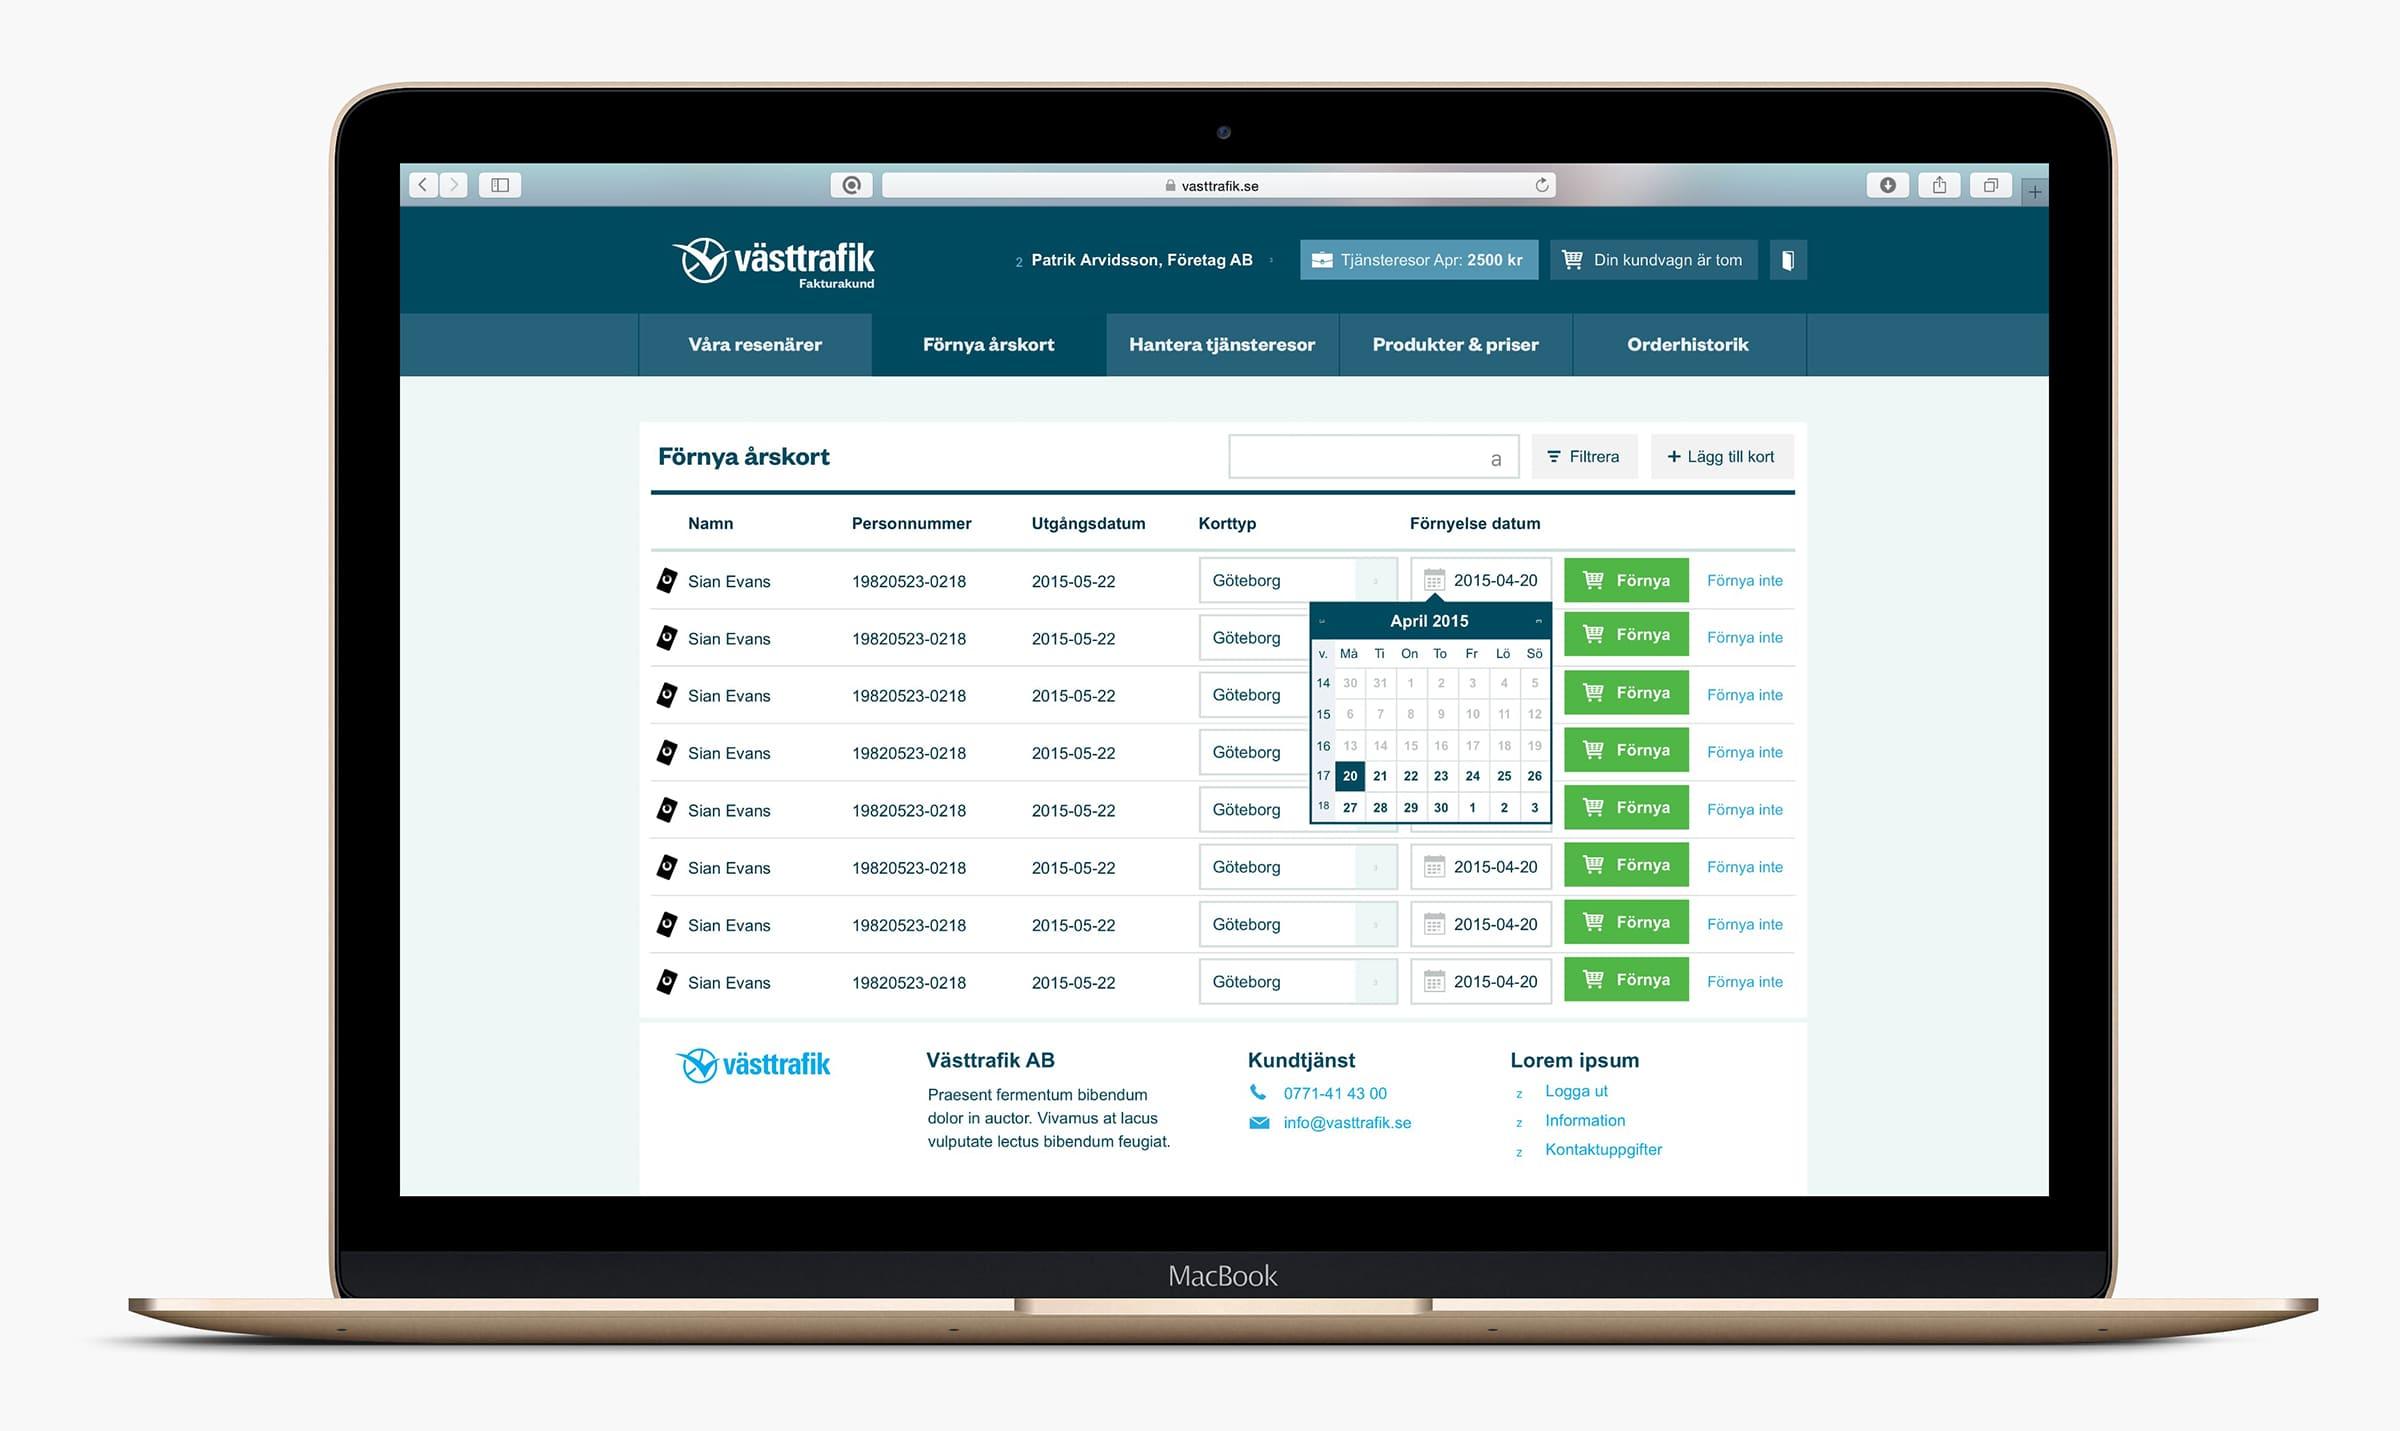 Västtrafik Portal renewal overview